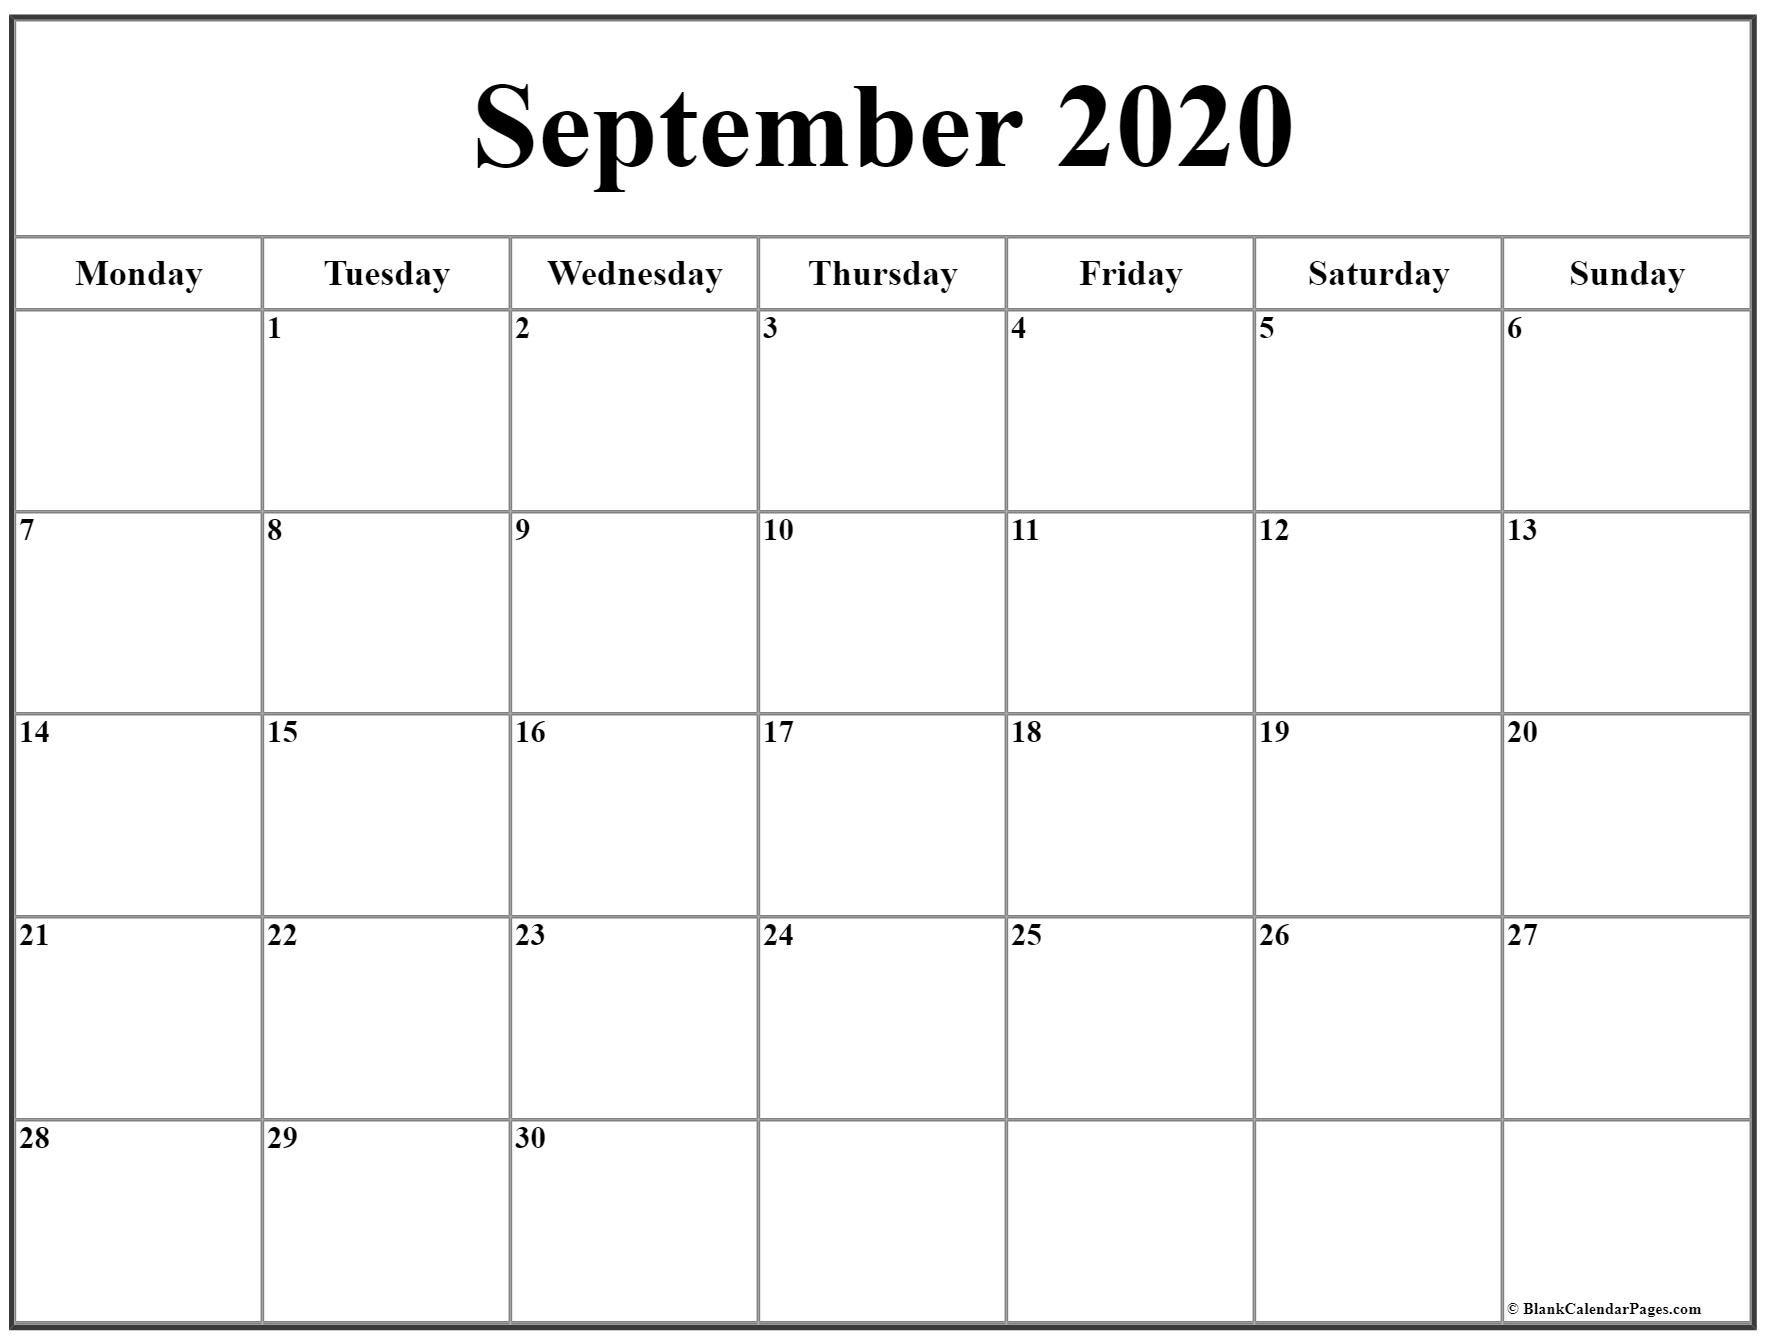 September 2020 Monday Calendar | Monday To Sunday Saturday Through Friday Calendar